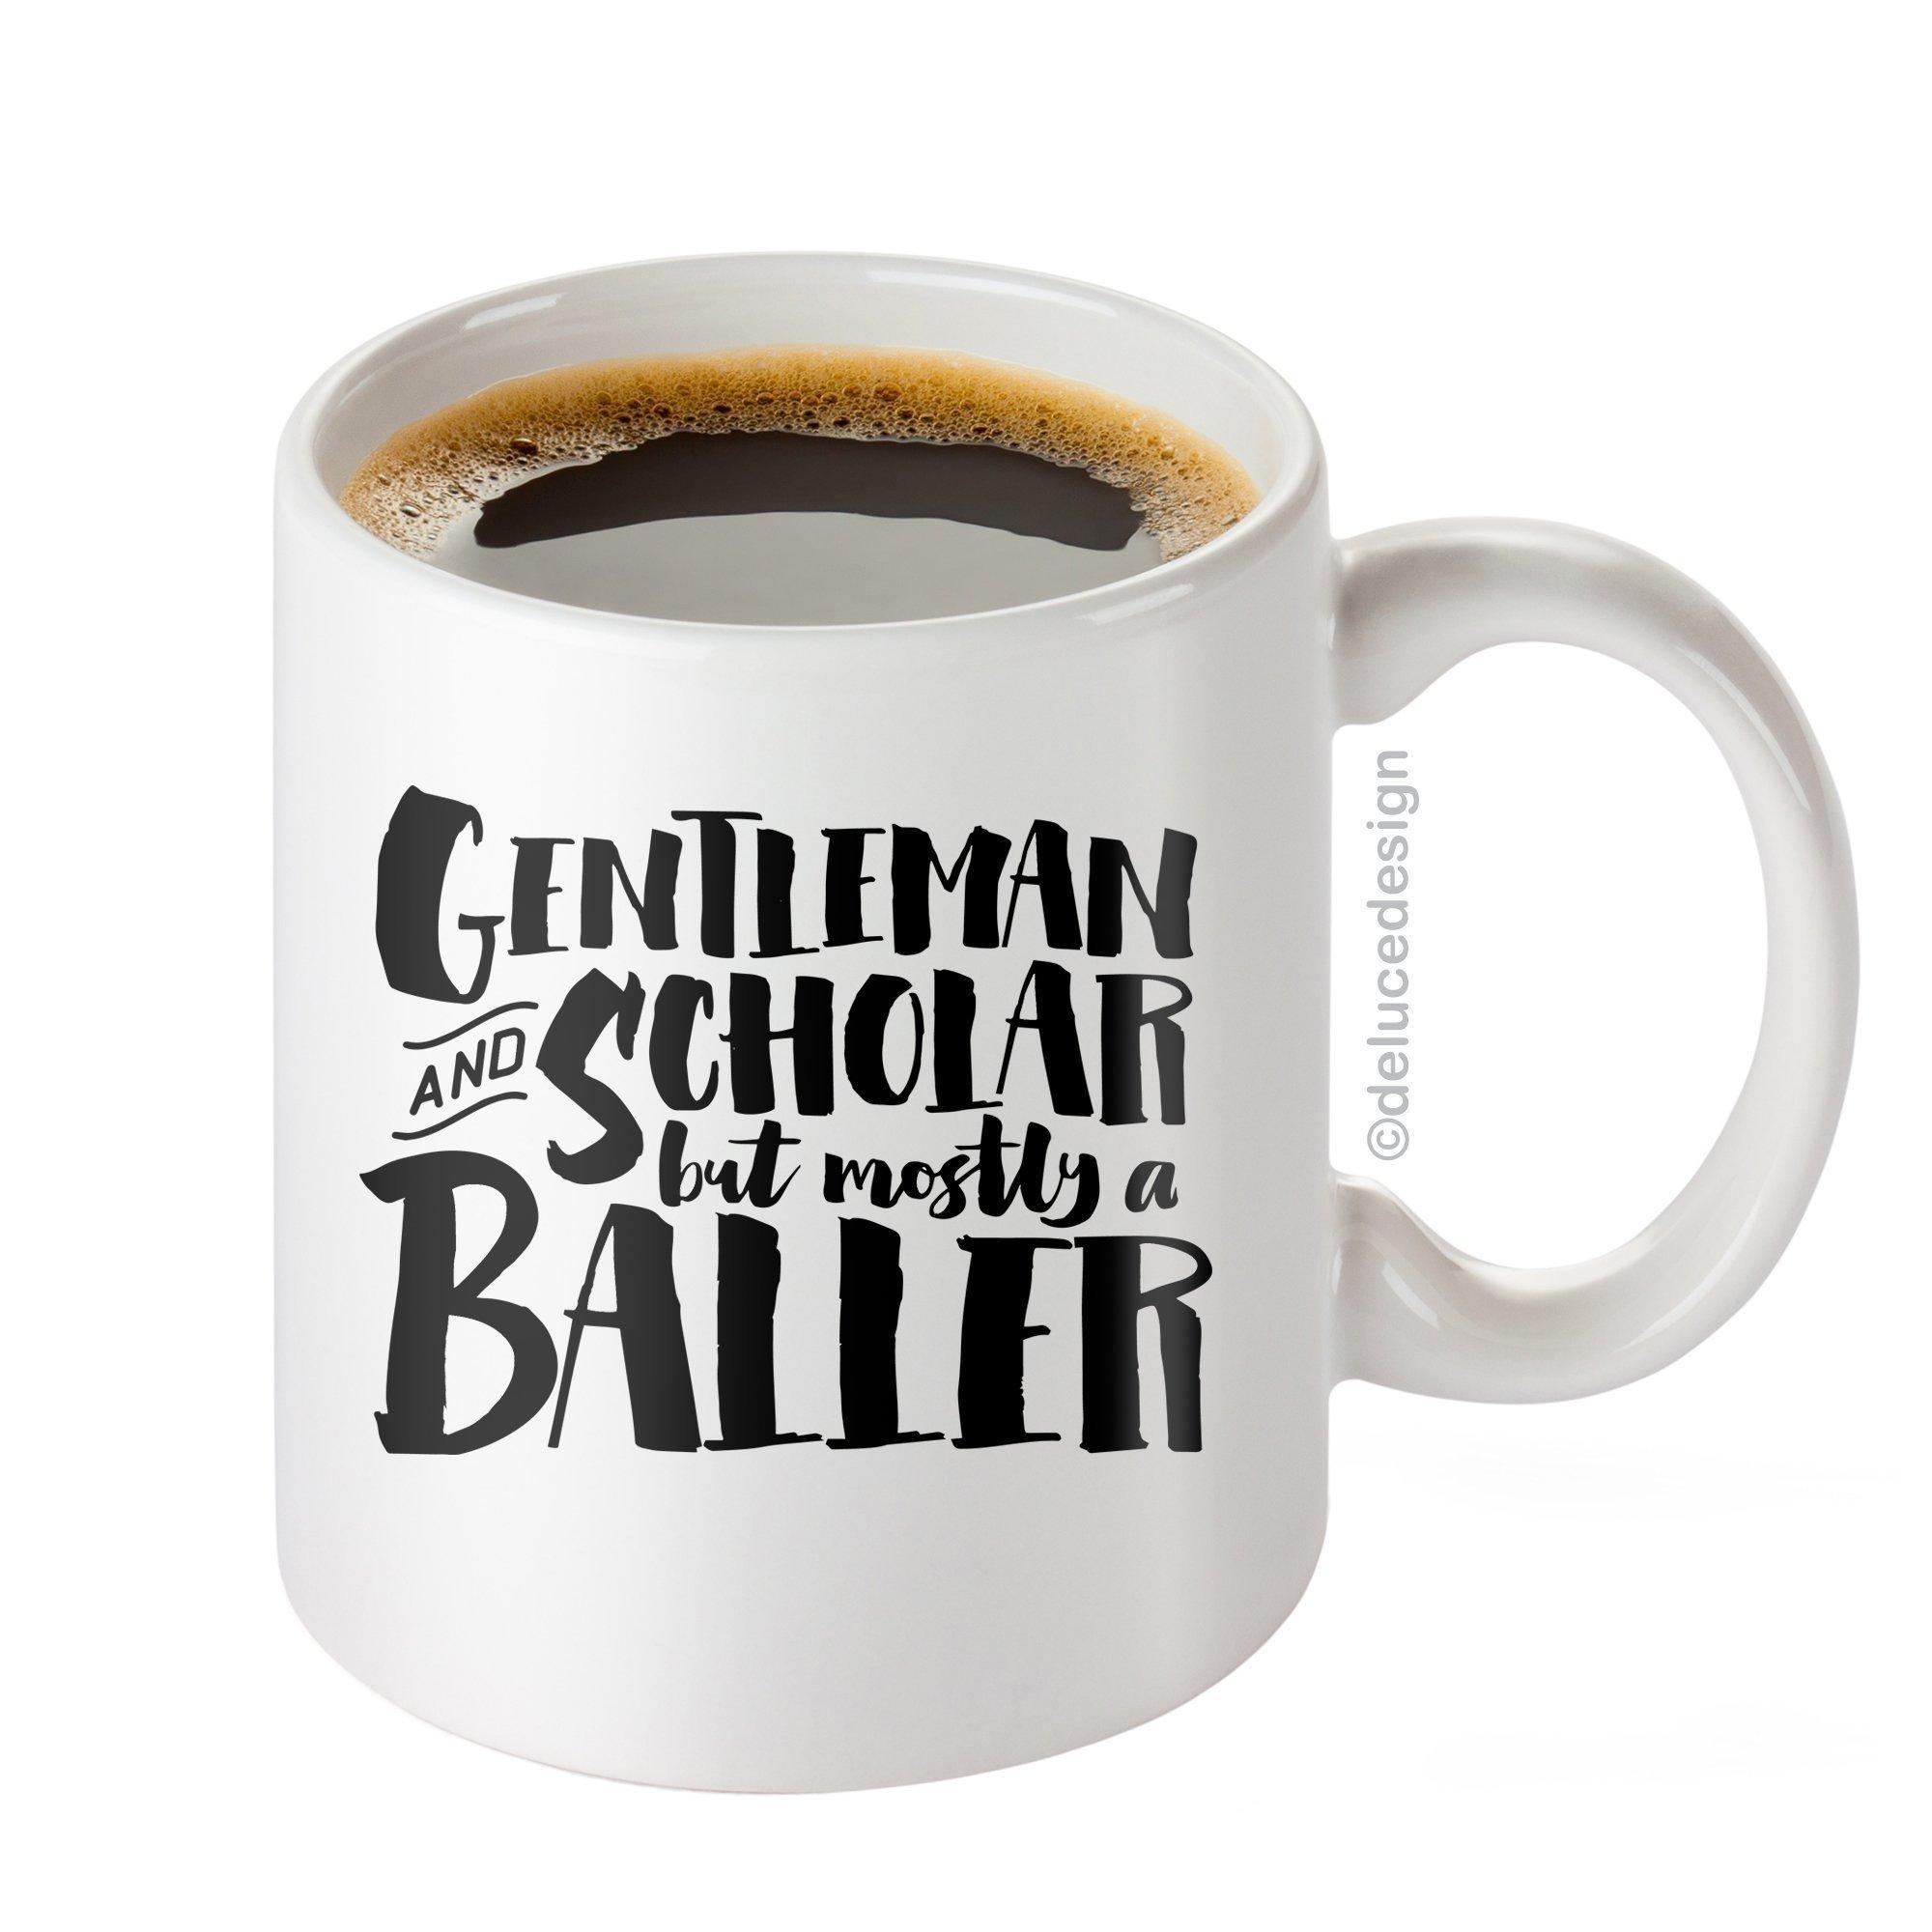 Funny Coffee Mug for Men / Gentleman And Scholar But Mostly a Baller Mug, Boss Mug, Graduate Coffee Mug, Father's Day Mug - DeLuce Design